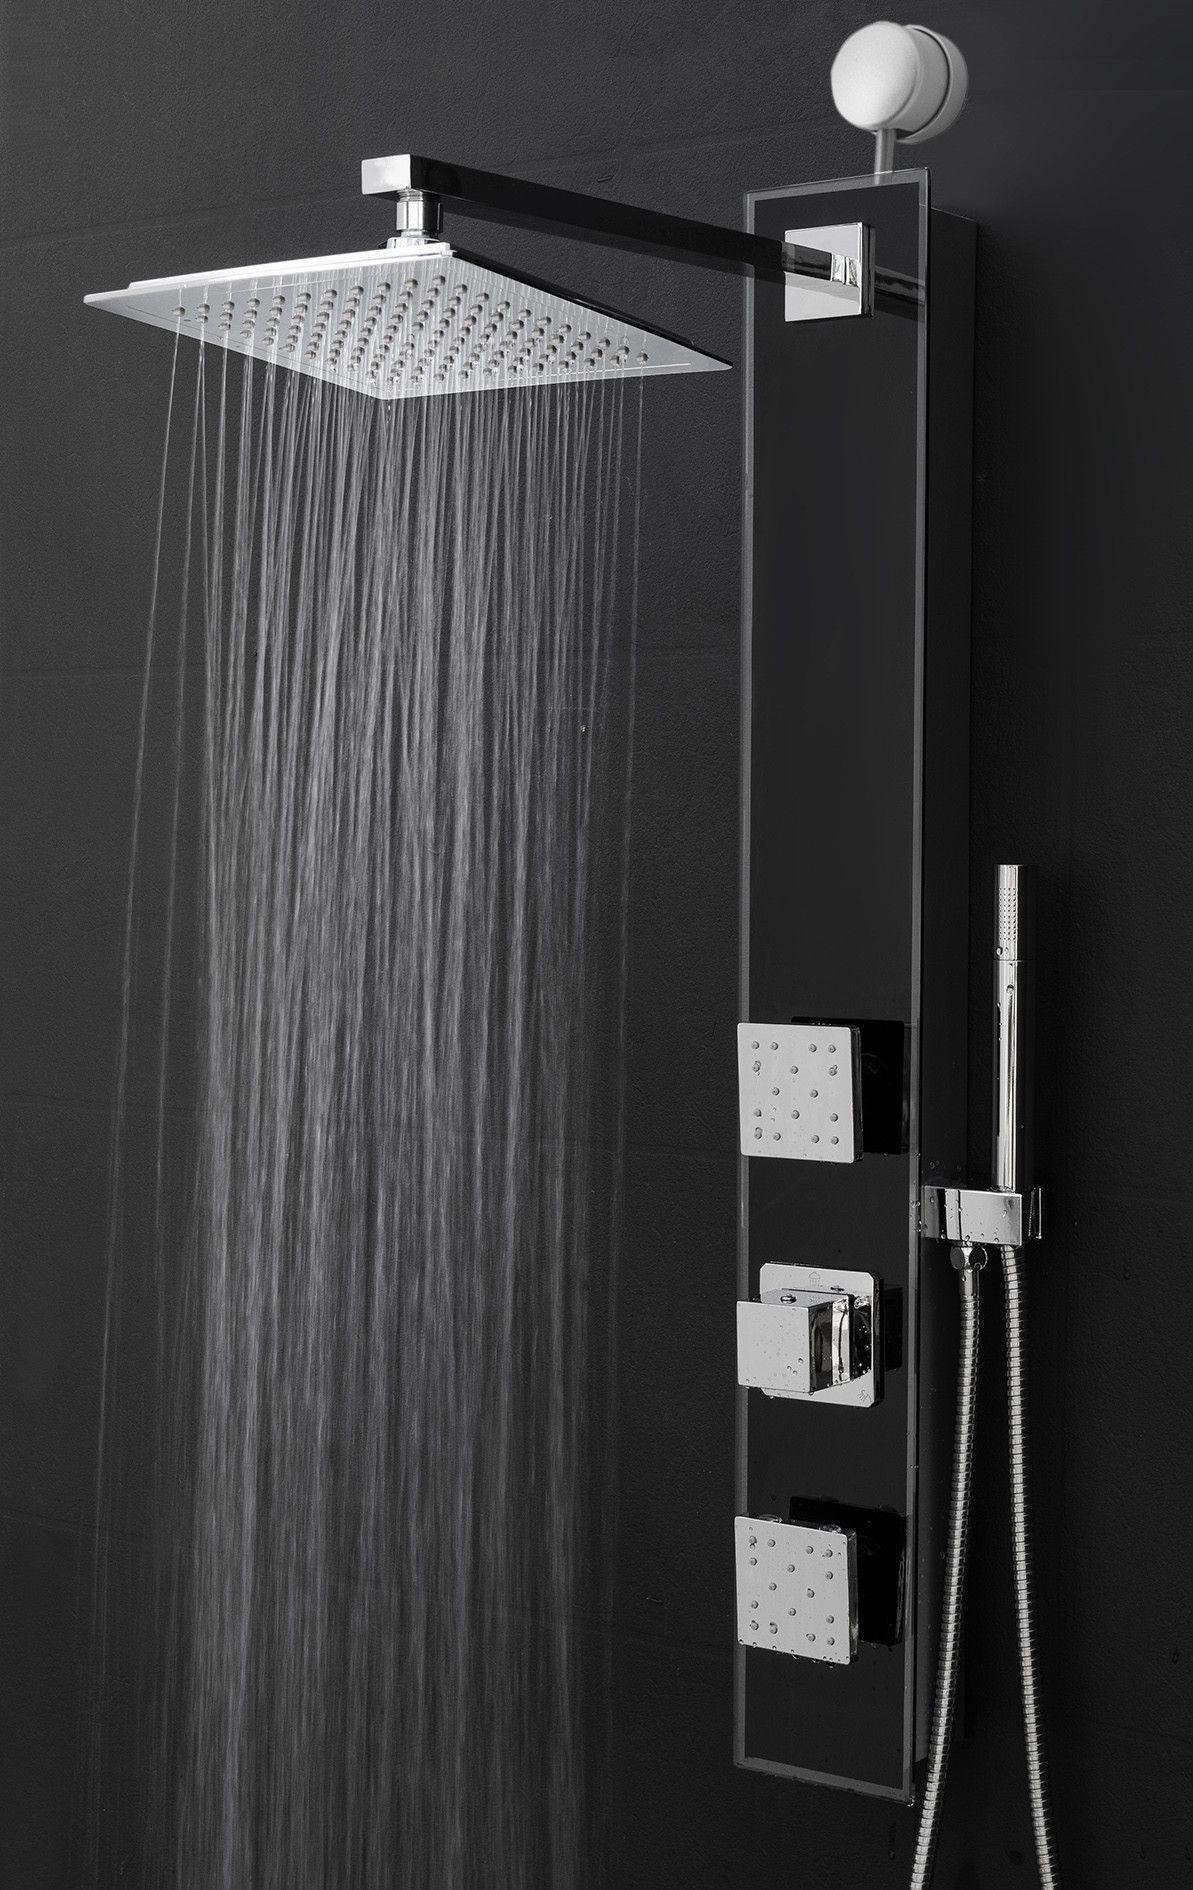 Rain Shower Head And Handheld.Diverter Rain Shower Head Shower Panel With Massage Function